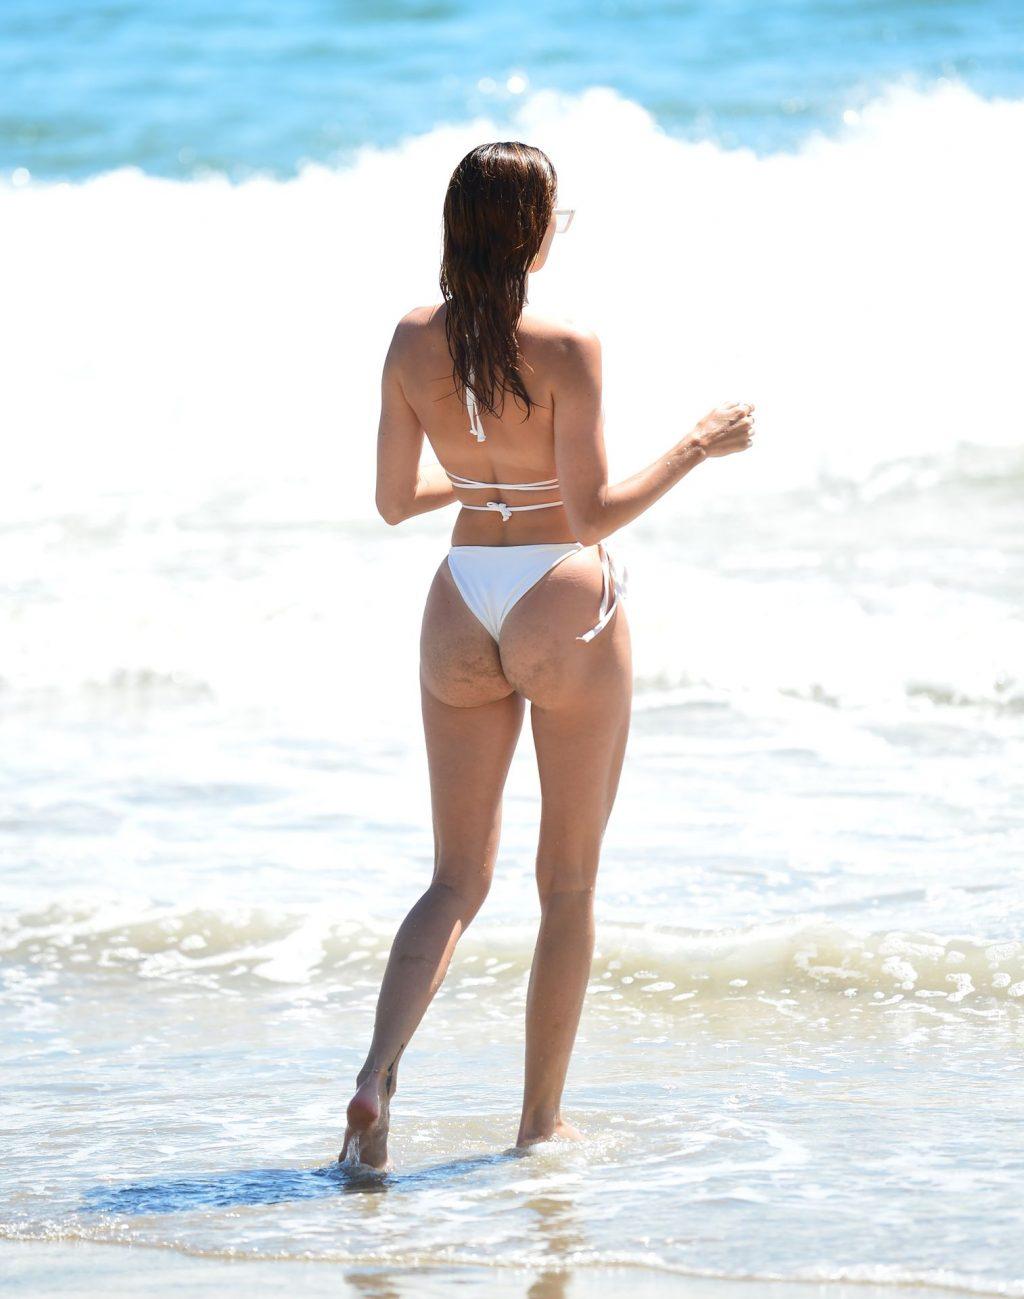 Nicole Williams Shows Off Her Incredible Bikini Body at the Beach (24 Photos)